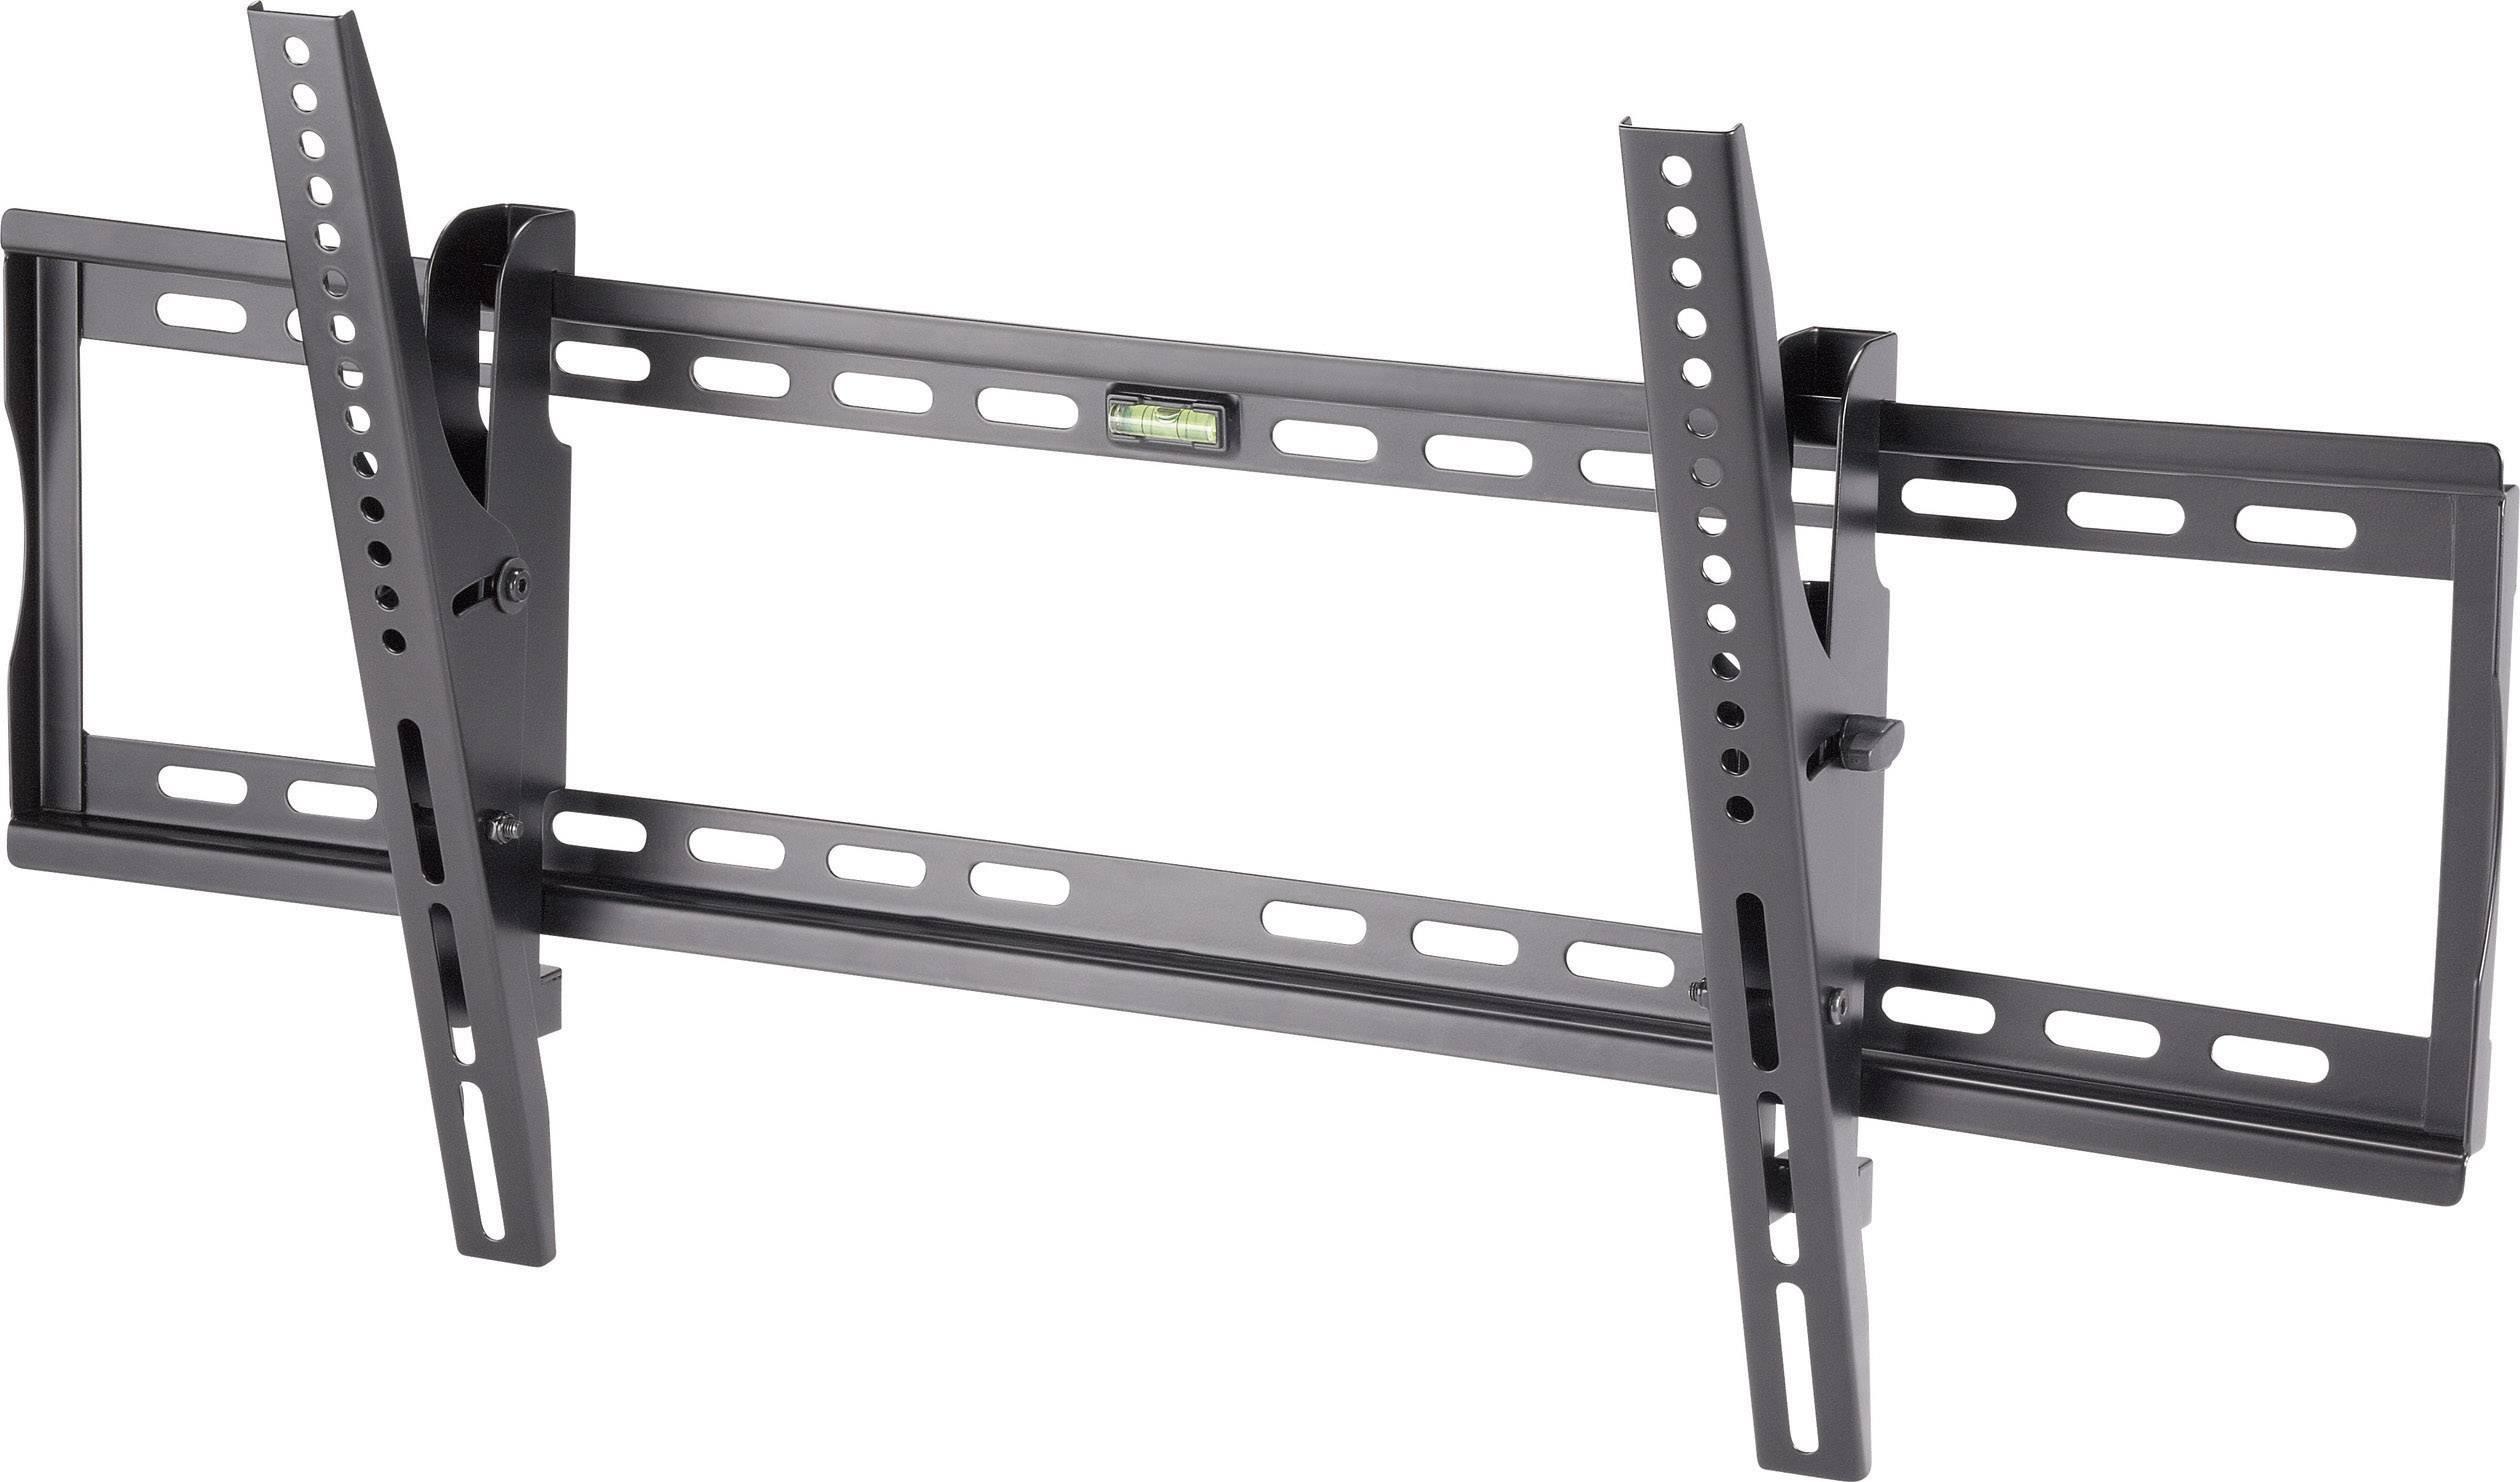 "TV držiak na stenu SpeaKa Professional 527503, sklápajúci, 106,7 cm (42"") - 203,2 cm (80"")"